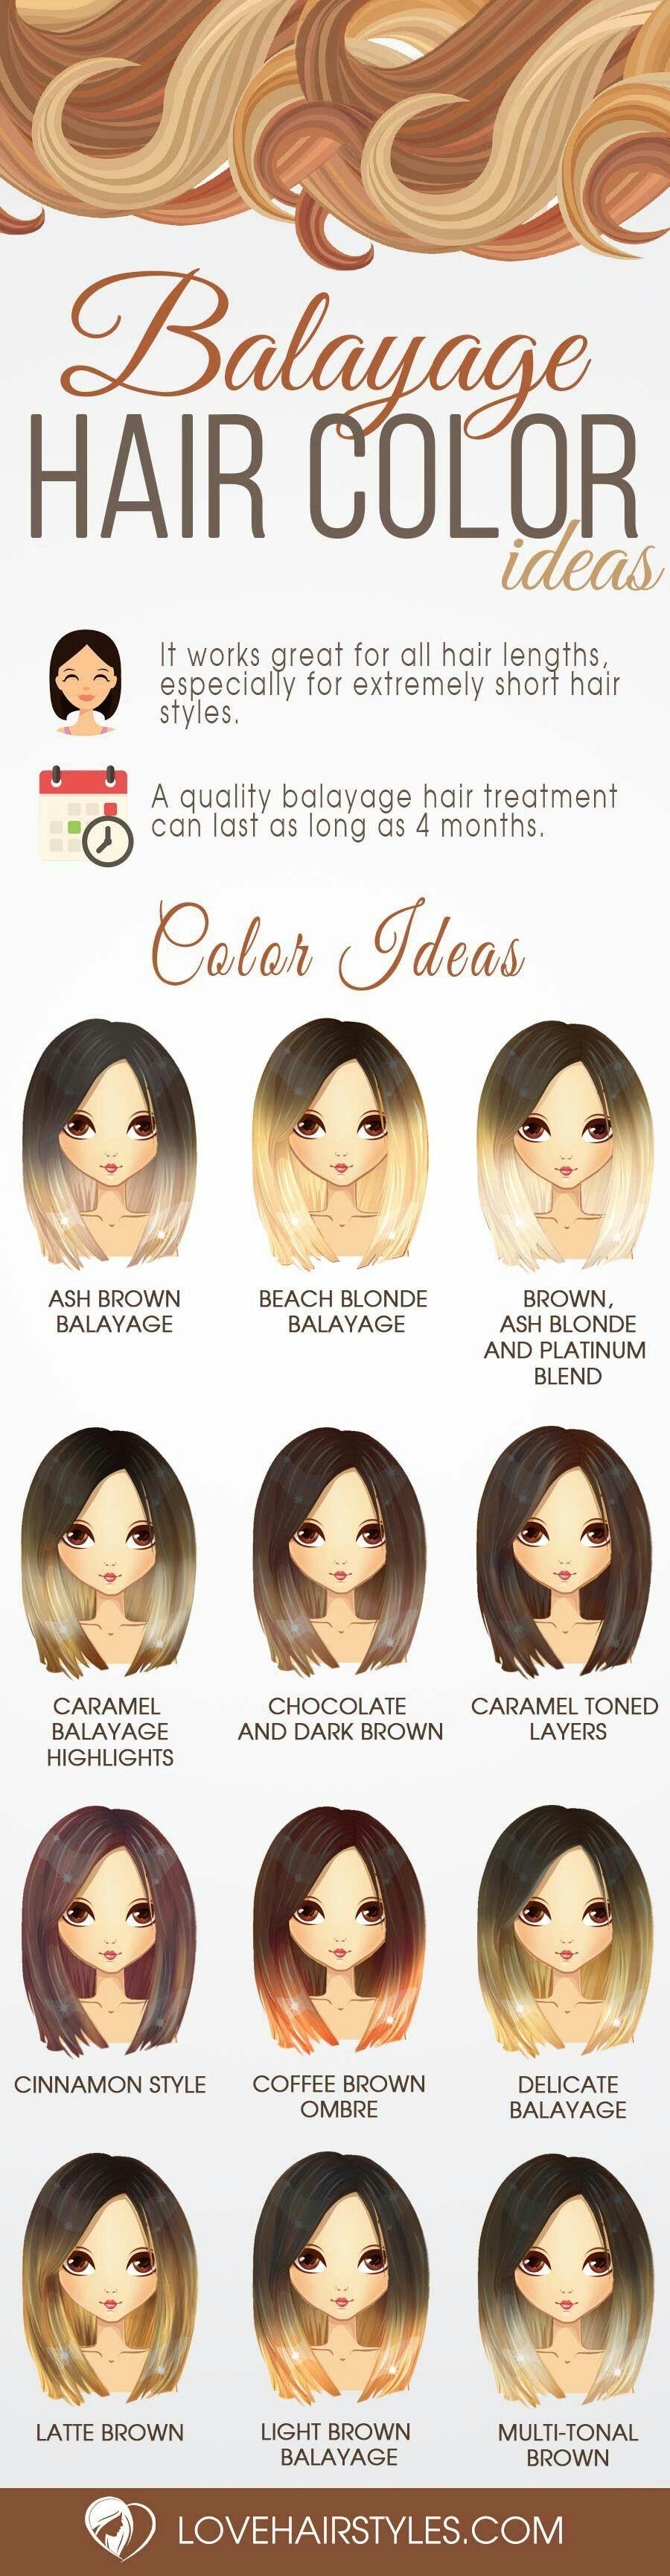 Pin by dianeeeya on hair color pinterest balayage hair